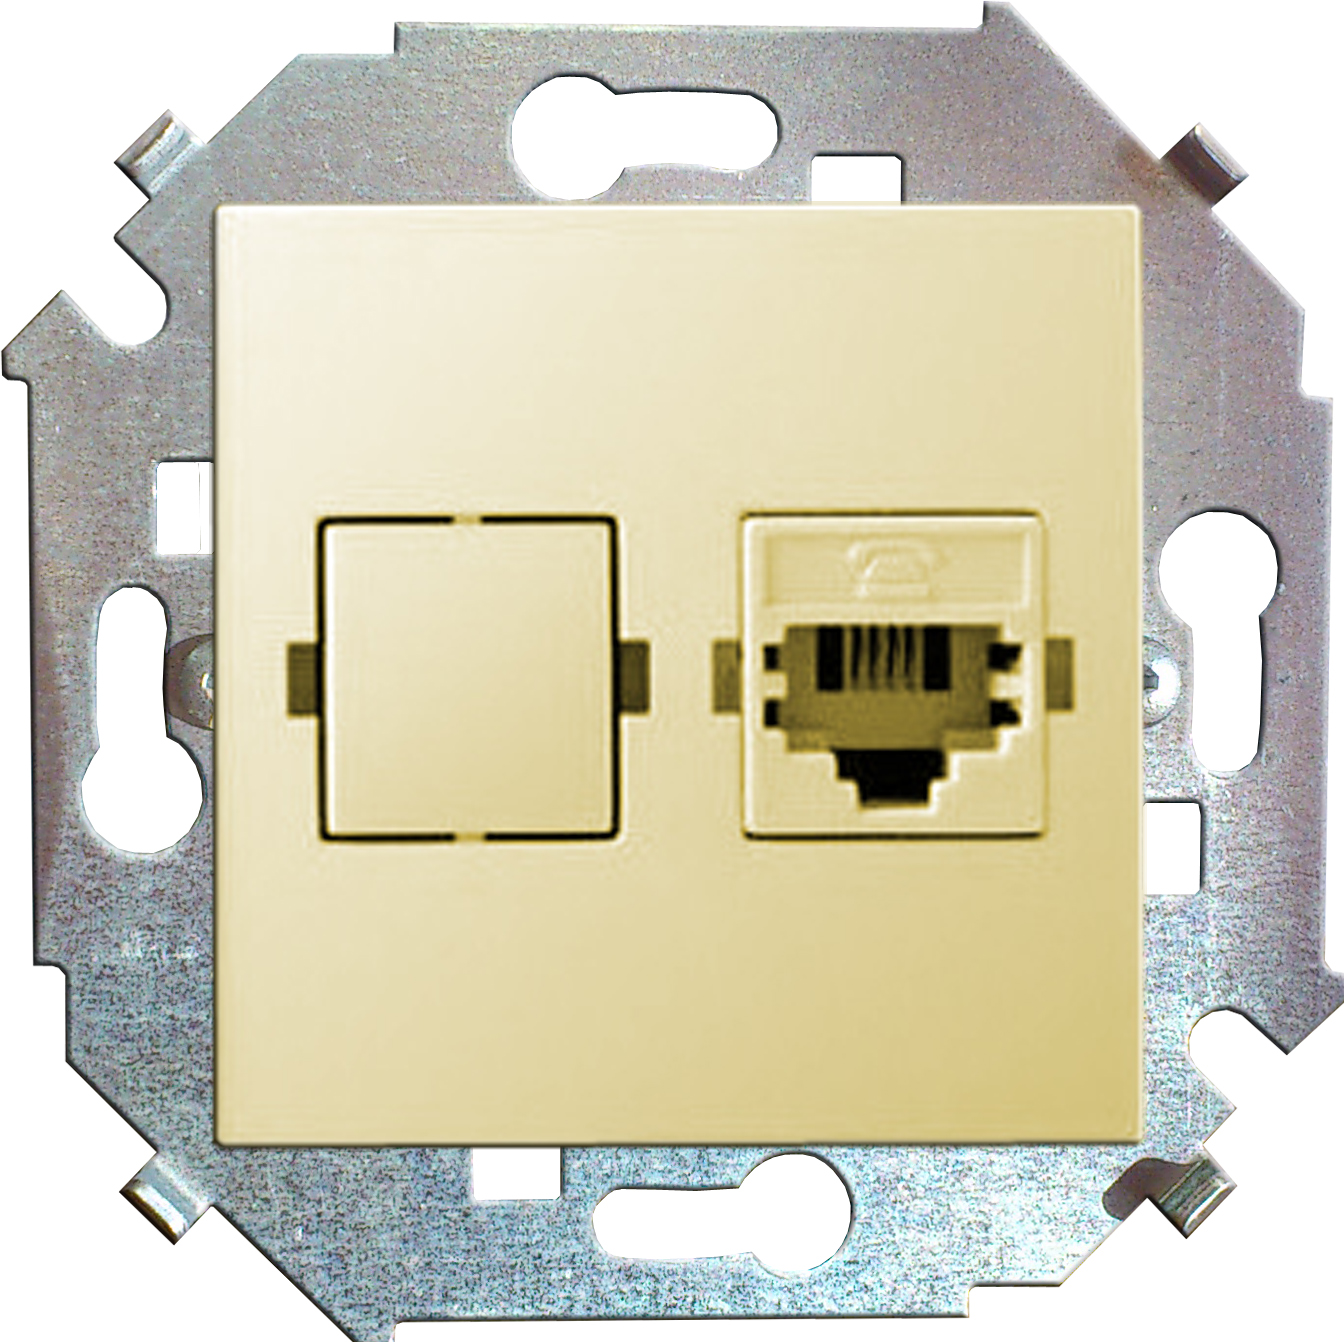 Розетка Simon 15 1591598-031 simon simon 15 белый розетка компьютерная 1 ая rj45 кат 5е 1591598 030